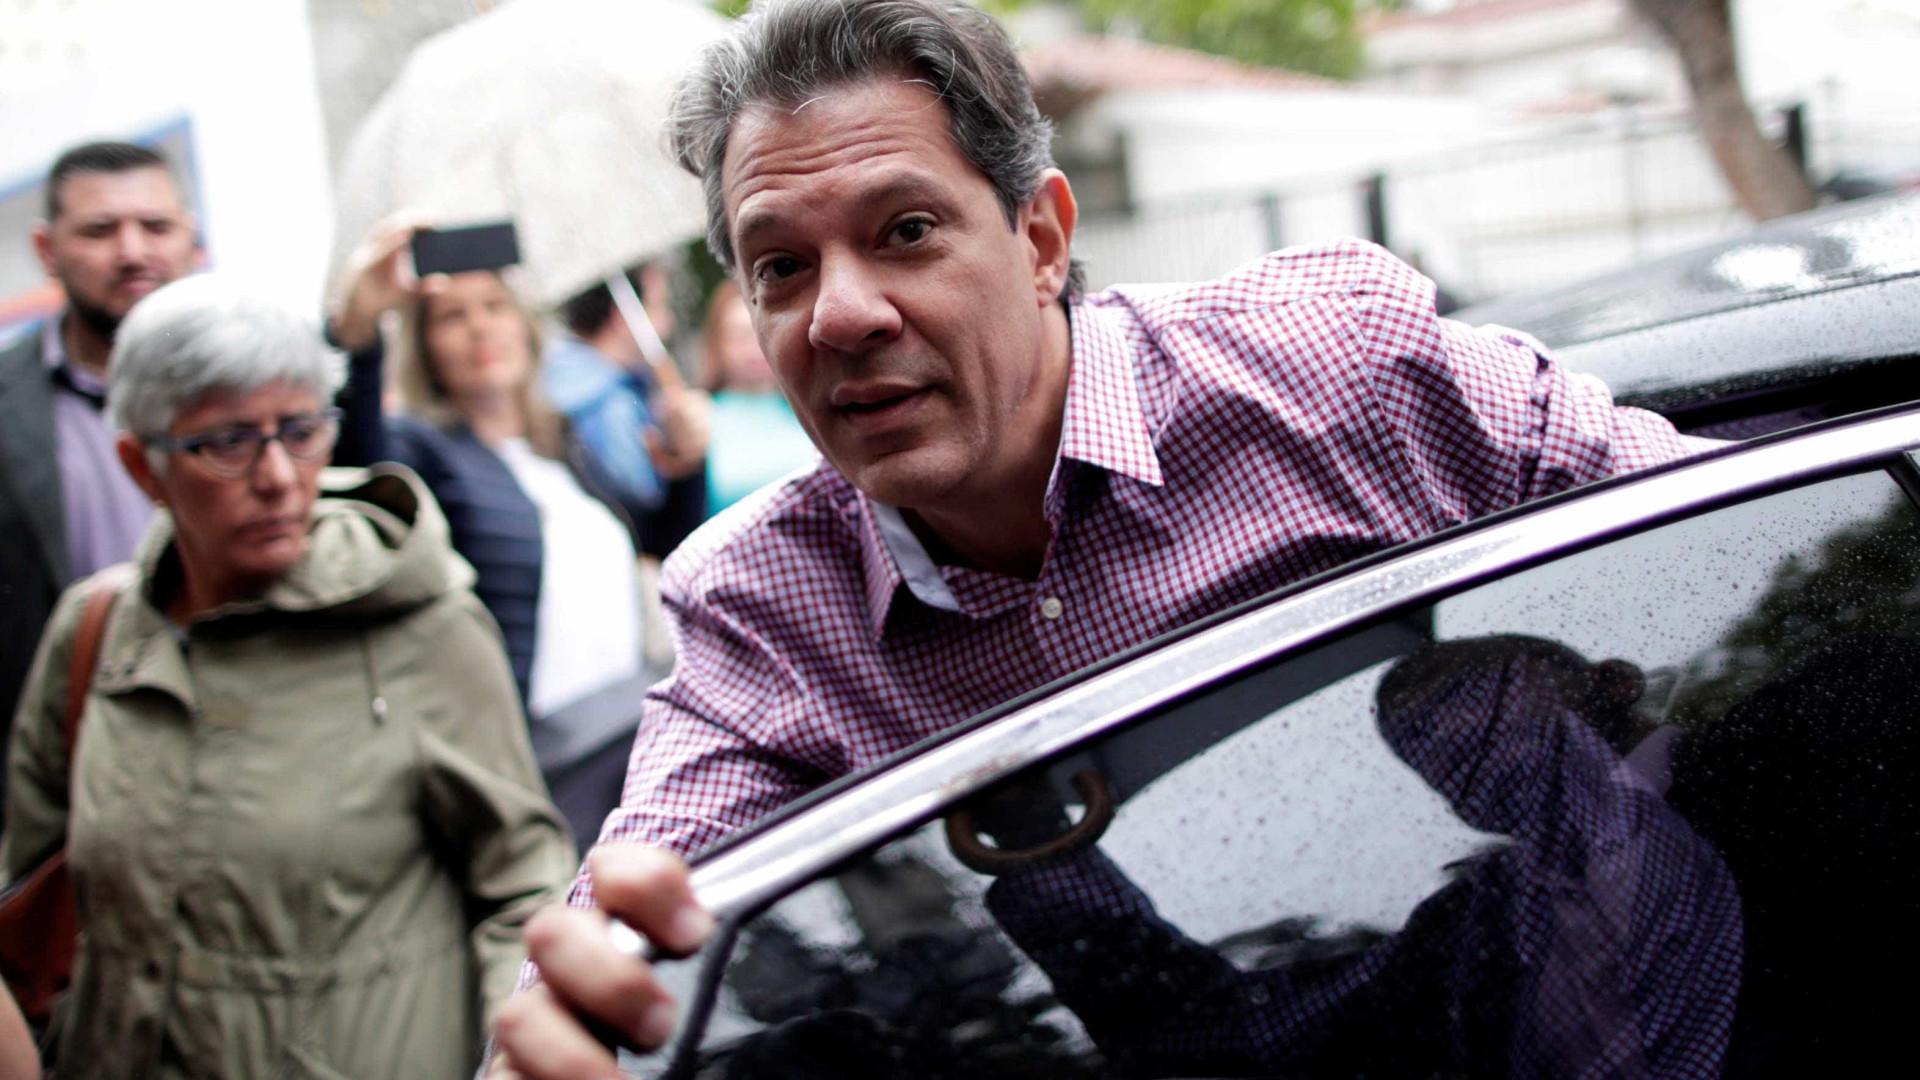 Na TV, Haddad mostrará incoerência de Bolsonaro sobre Bolsa Família